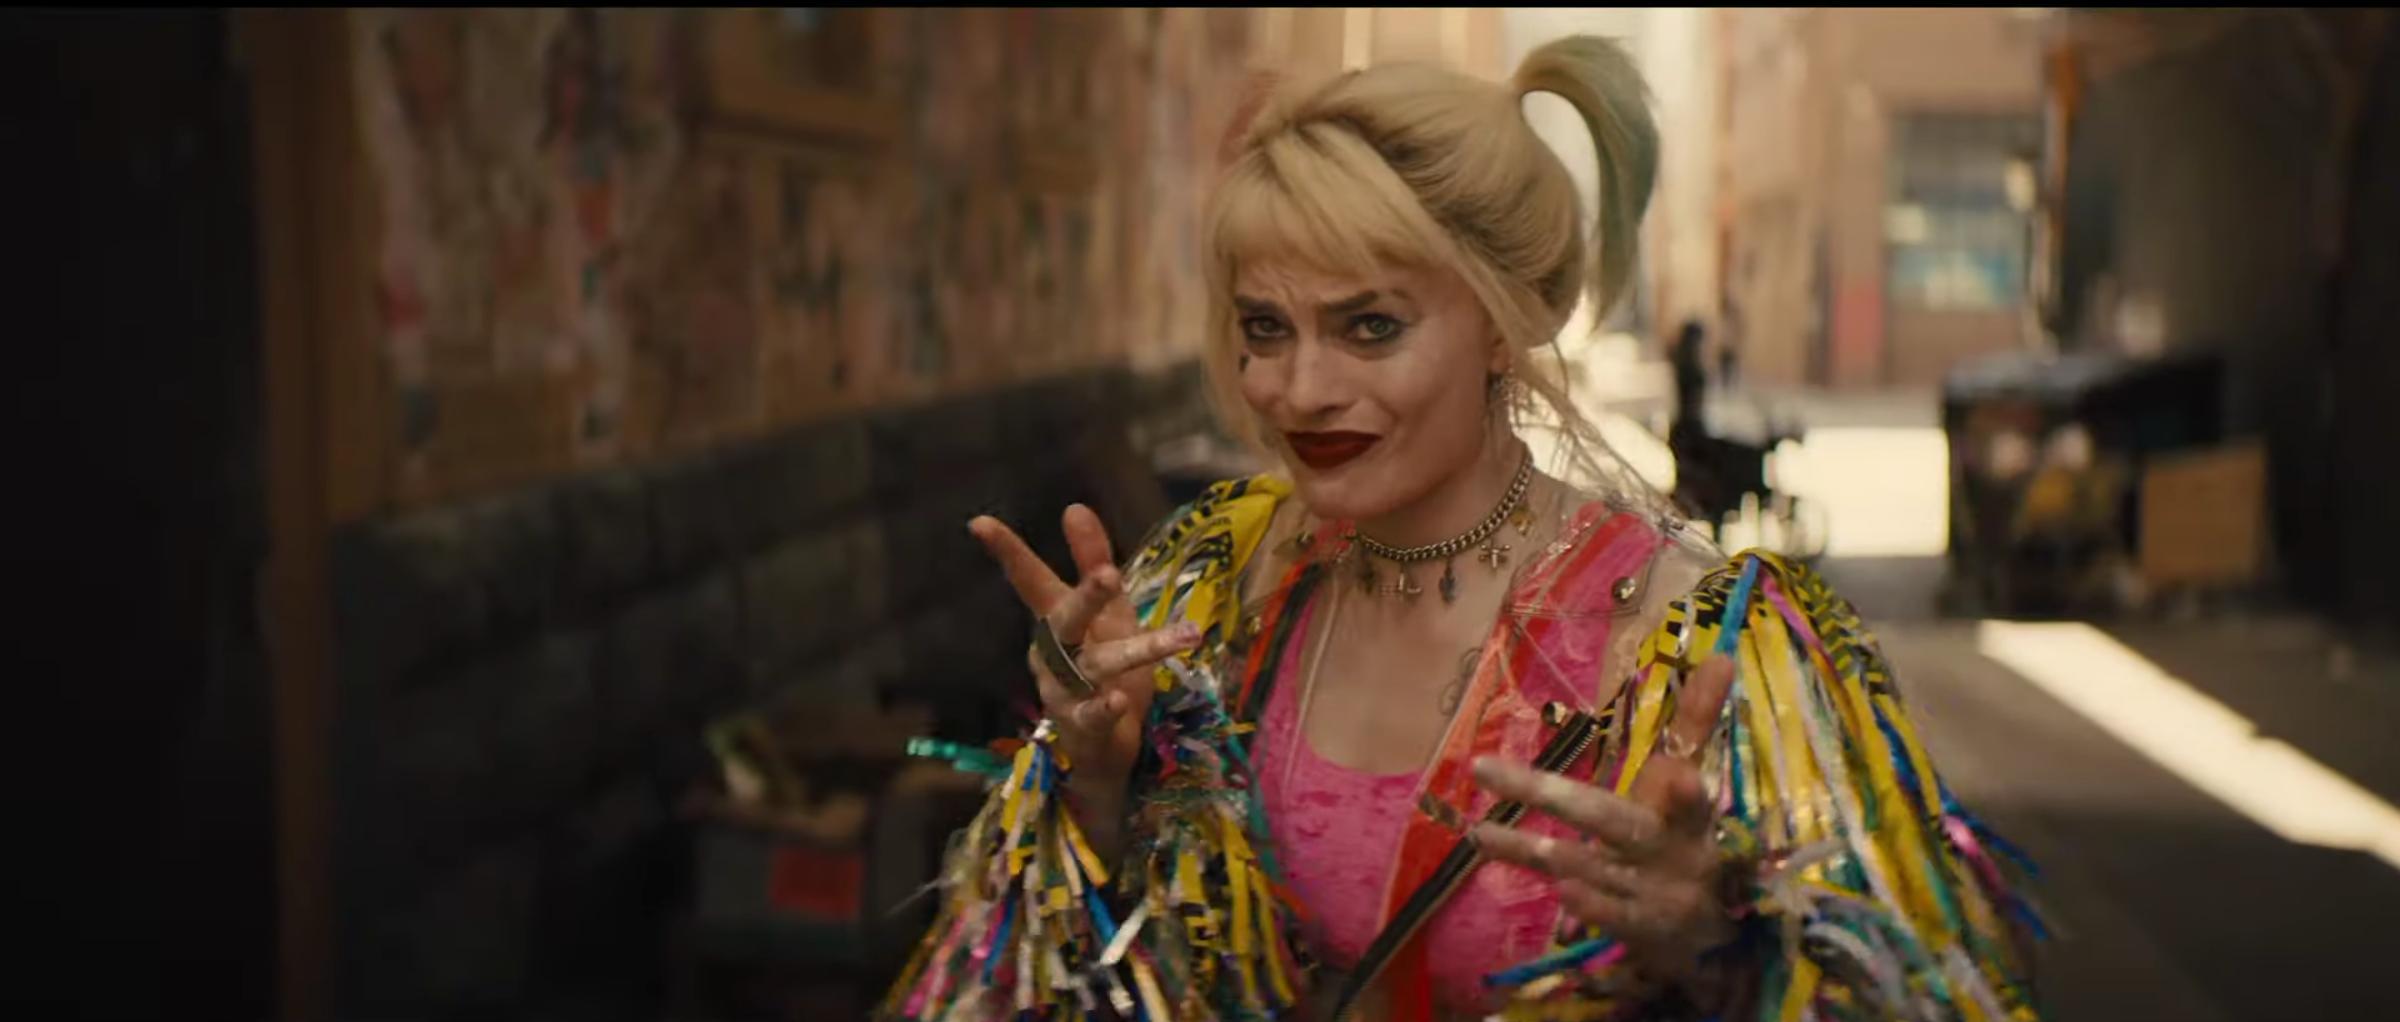 Birds Of Prey Harley Quinn S Costume Designer On Her New Look Collider